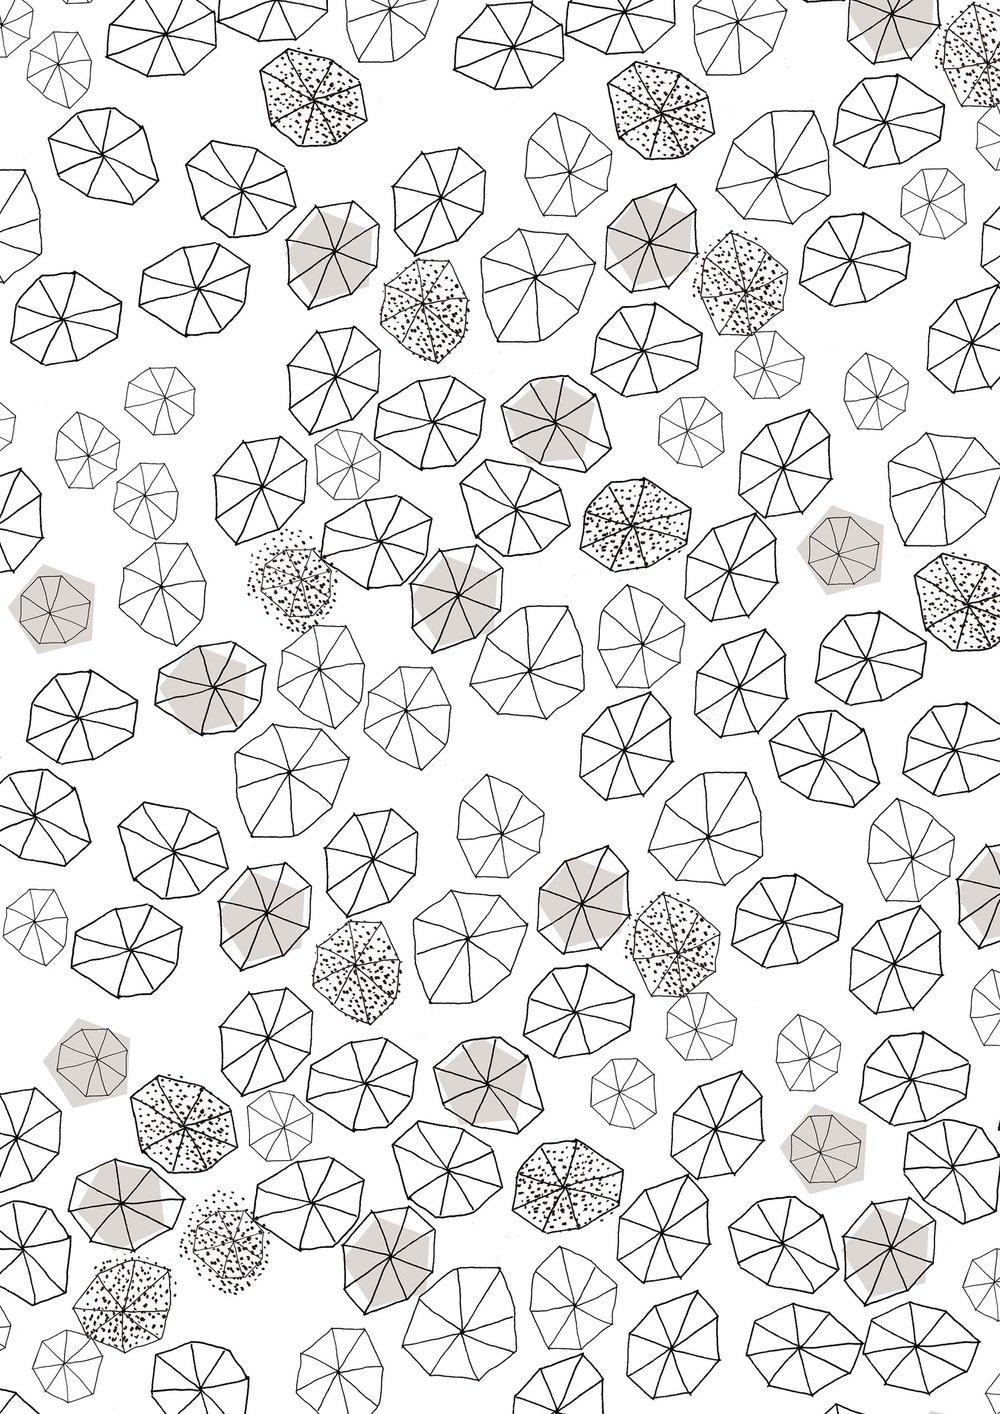 umbrellarepeat-website.jpg